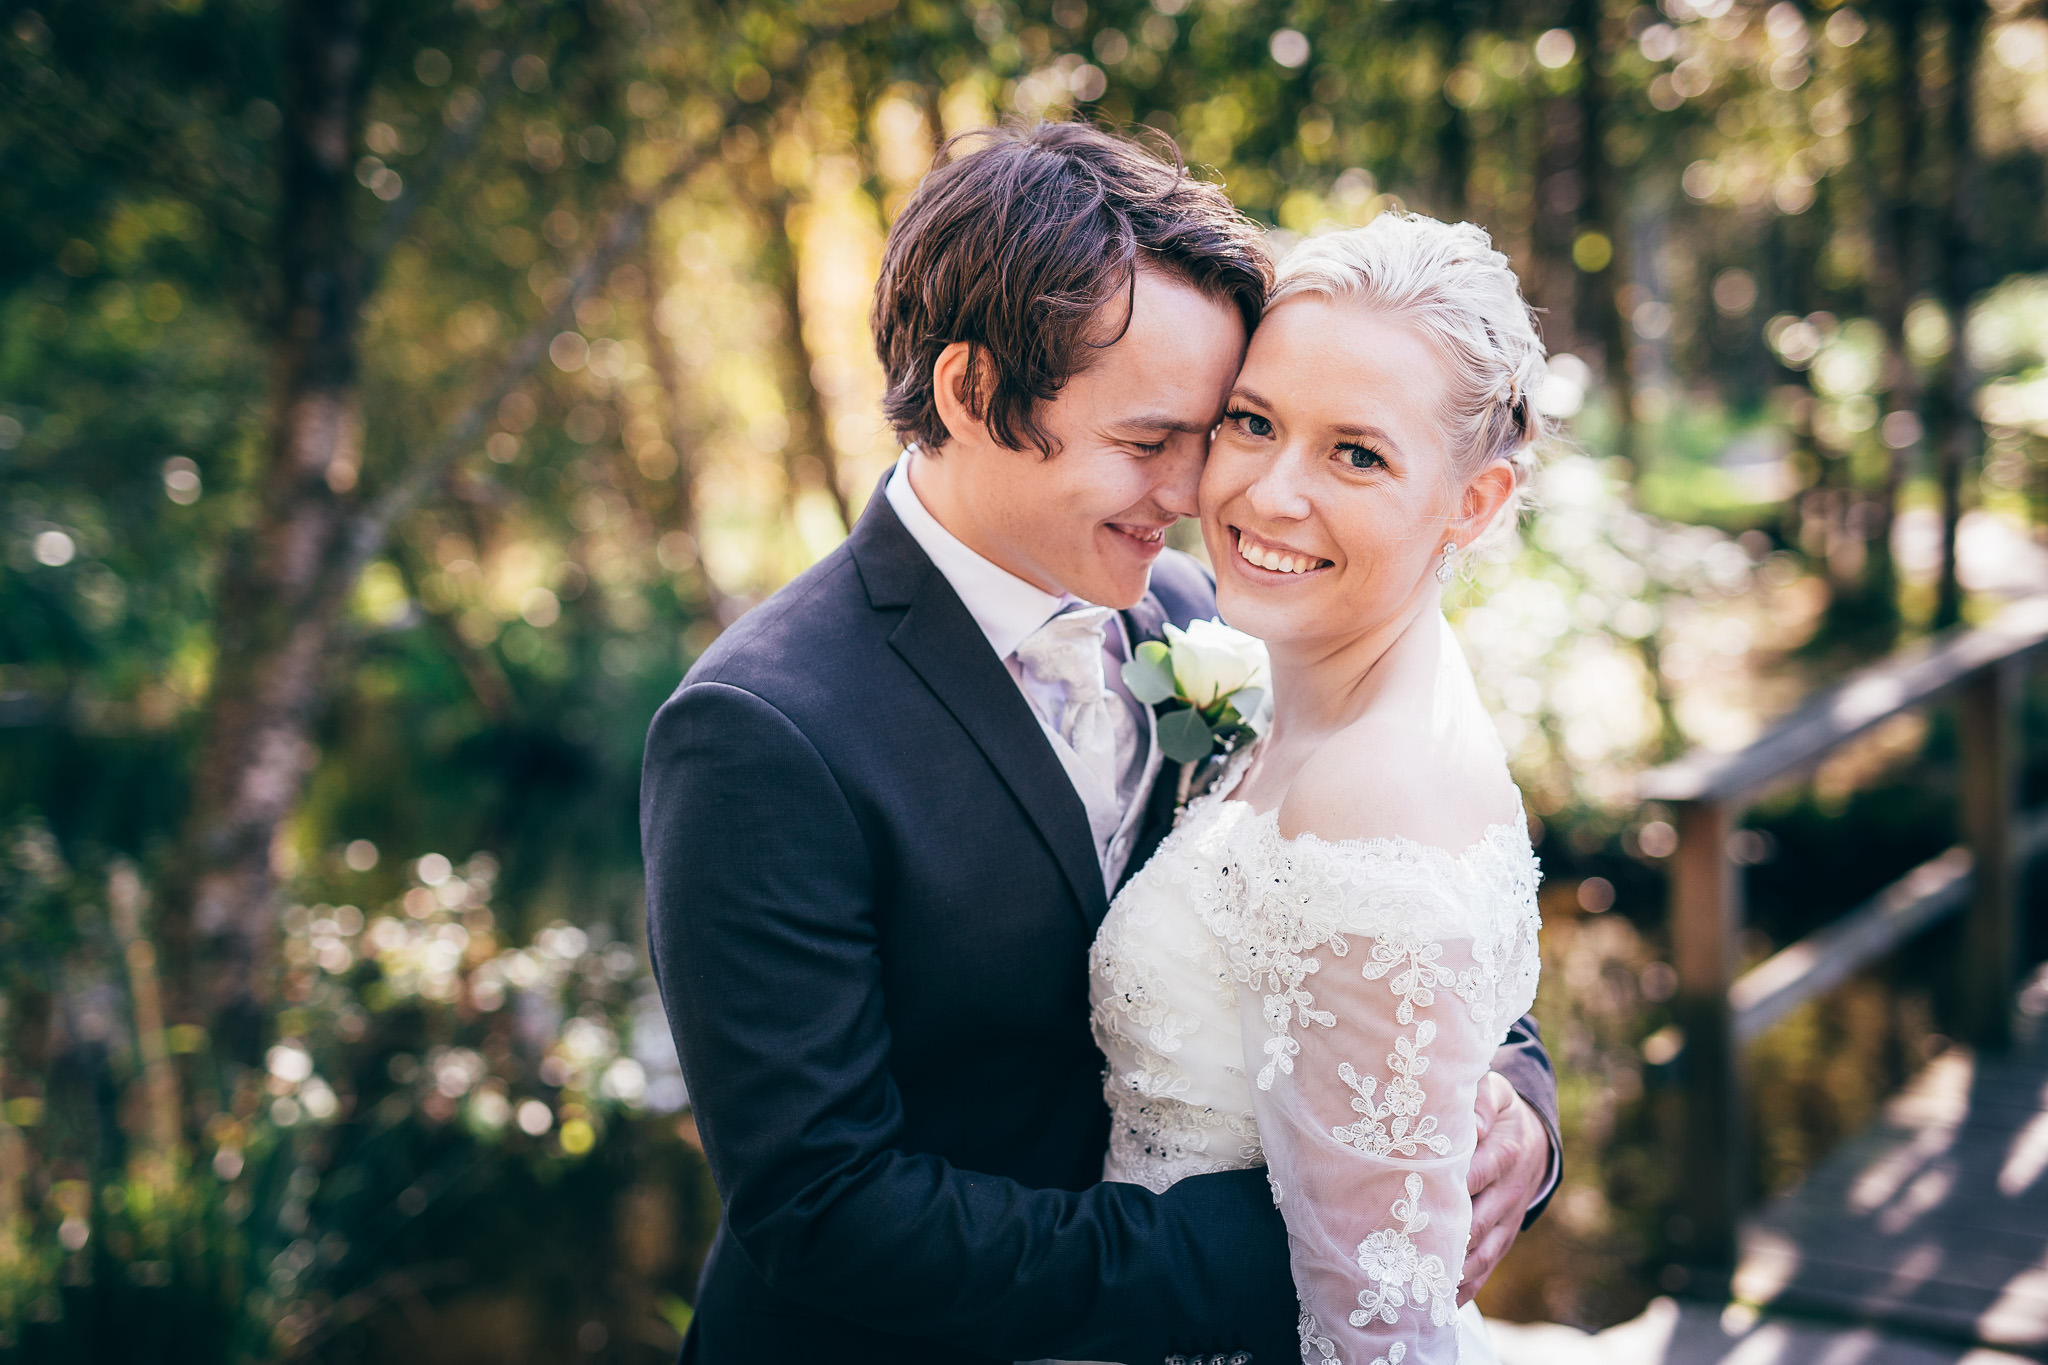 Wedding+Photographer+Norway+Bryllupsfotograf+Casey+Arneson+JT-91.jpg